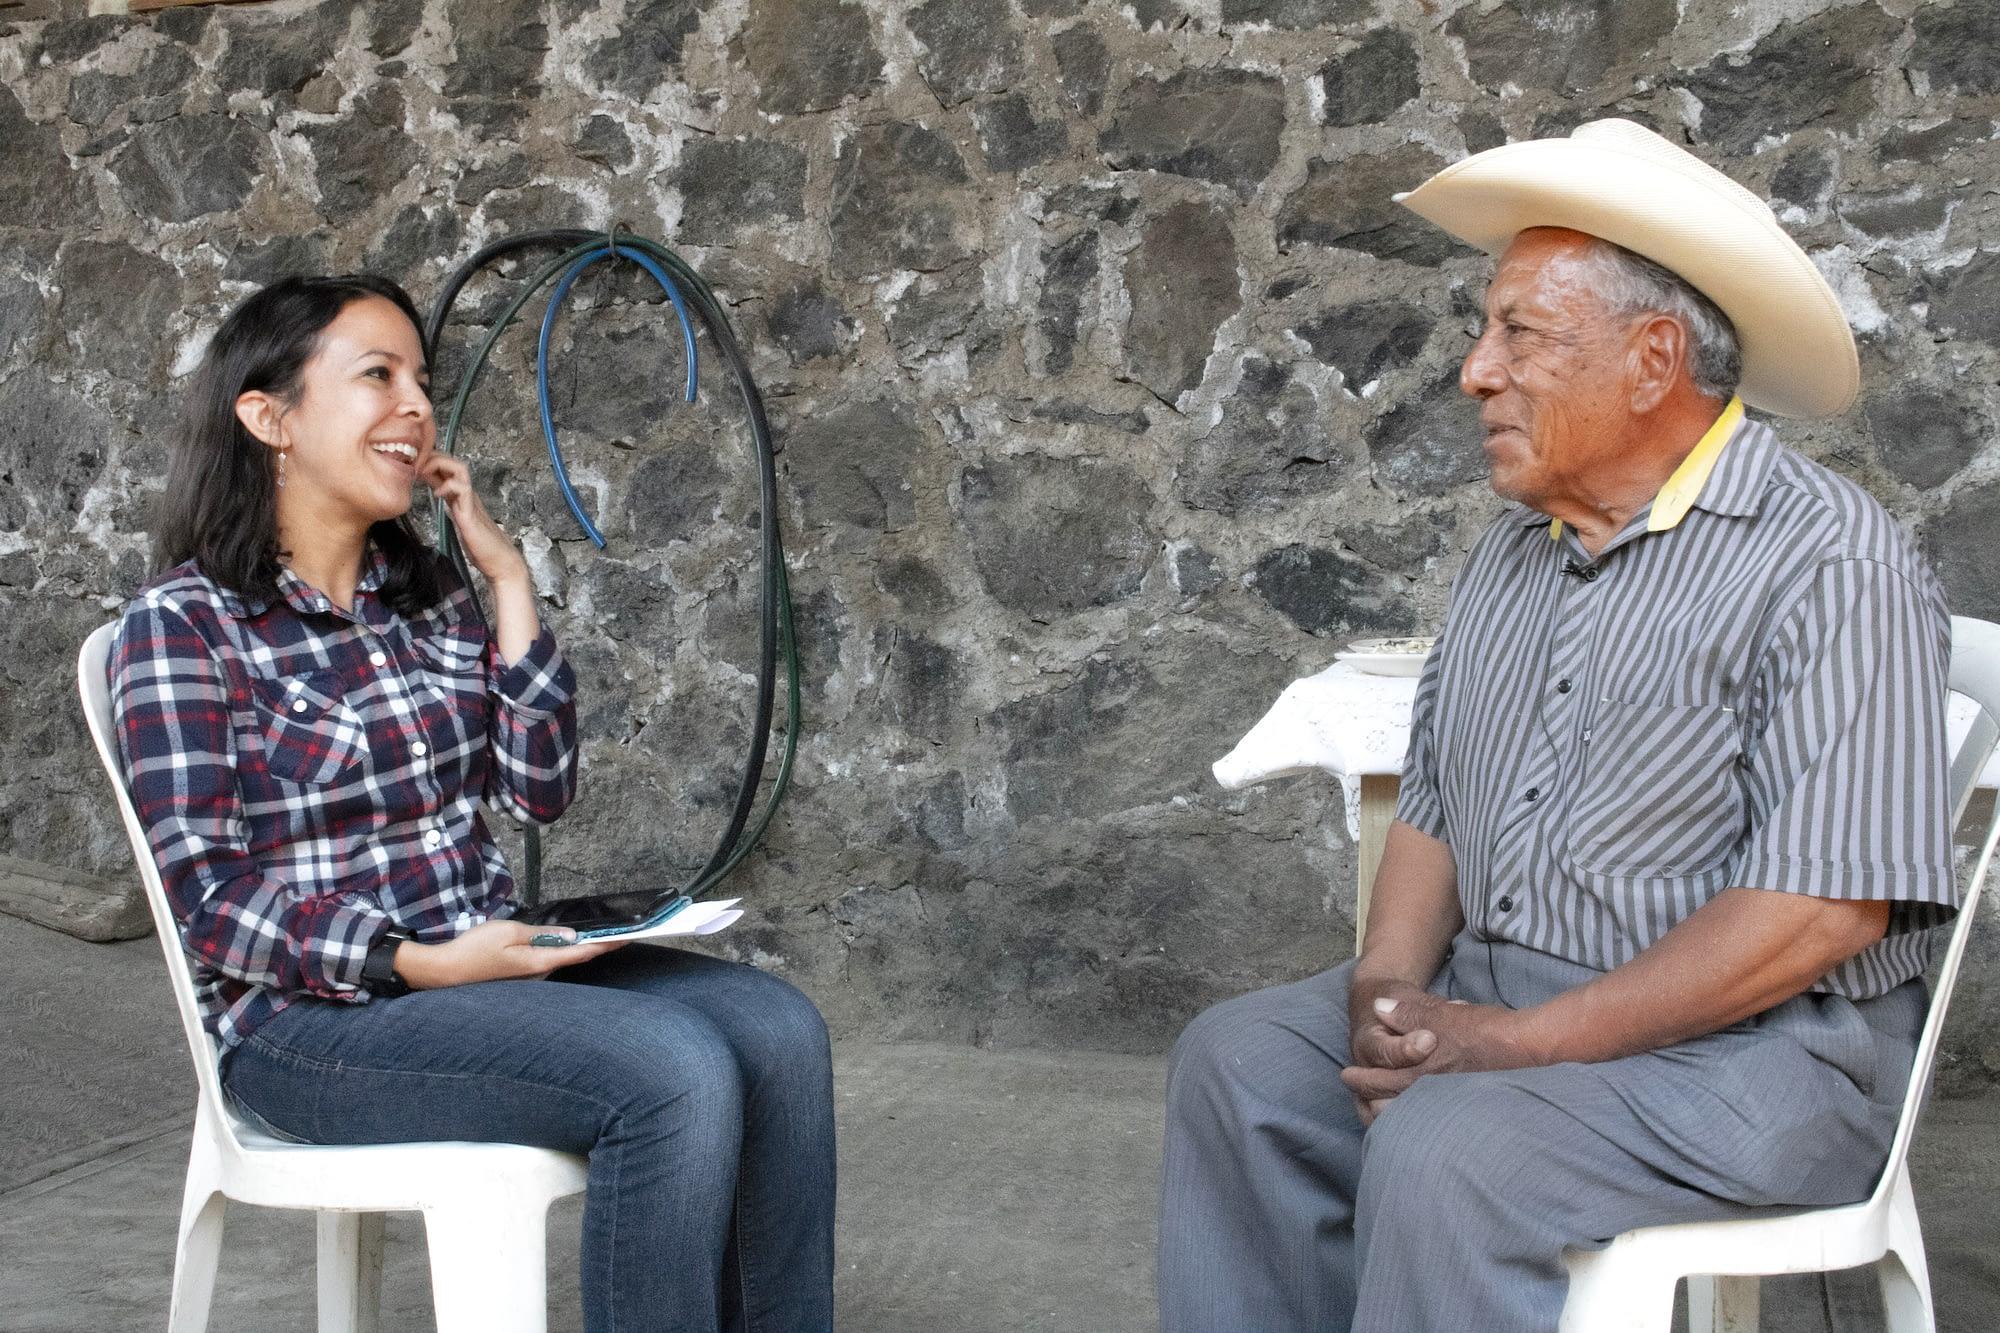 Doctoral candidate Denisse McLean-Rodríguez (left) interviews maize farmer Roque Juarez Ramirez at his family home in Morelos to explore his opinions on landrace conservation. (Photo: E. Orchardson/CIMMYT)